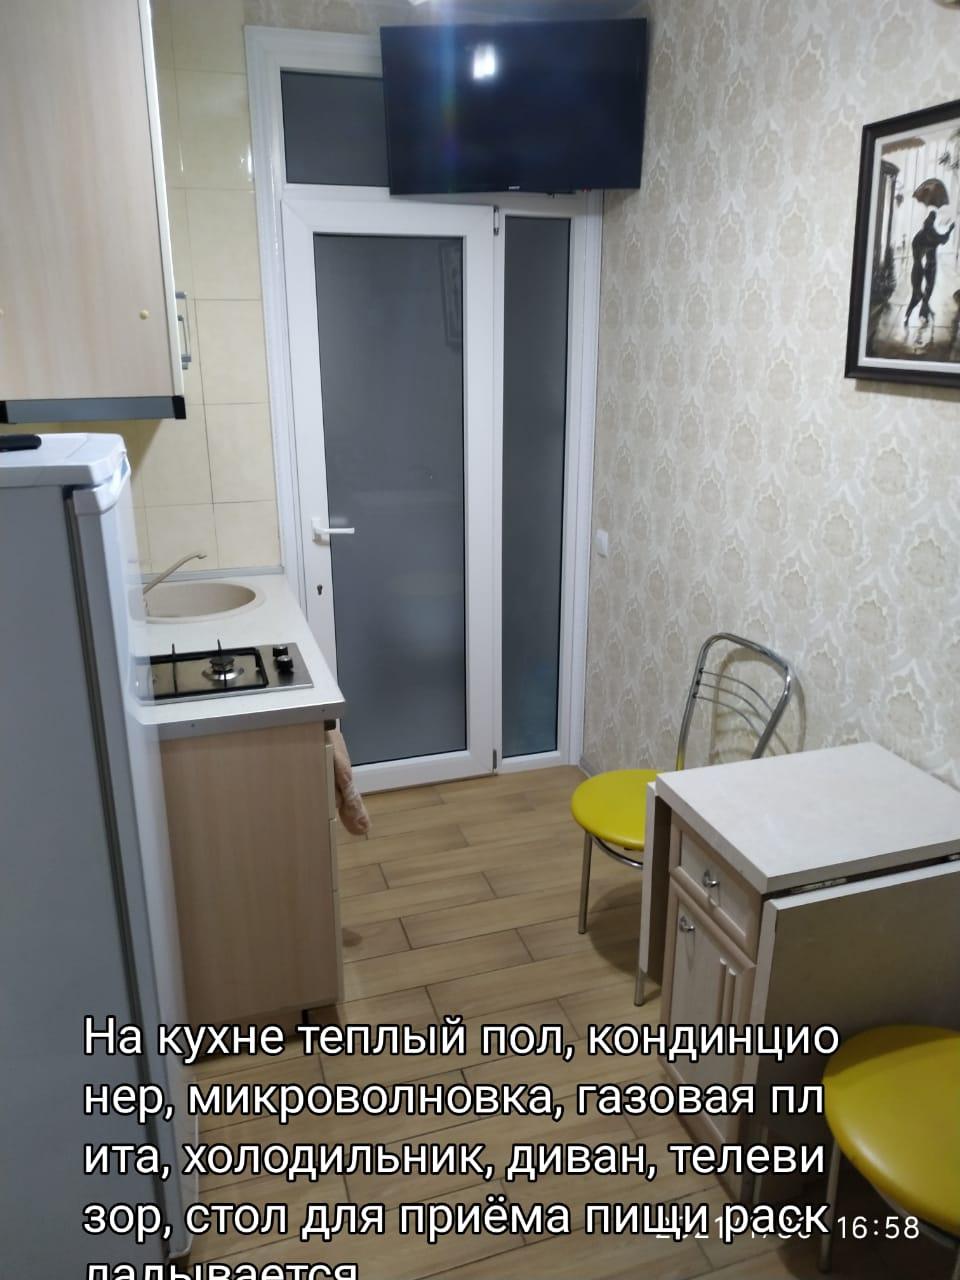 https://yaltaroom.ru/wp-content/uploads/2021/02/WhatsApp-Image-2021-02-22-at-13.57.17-1.jpeg